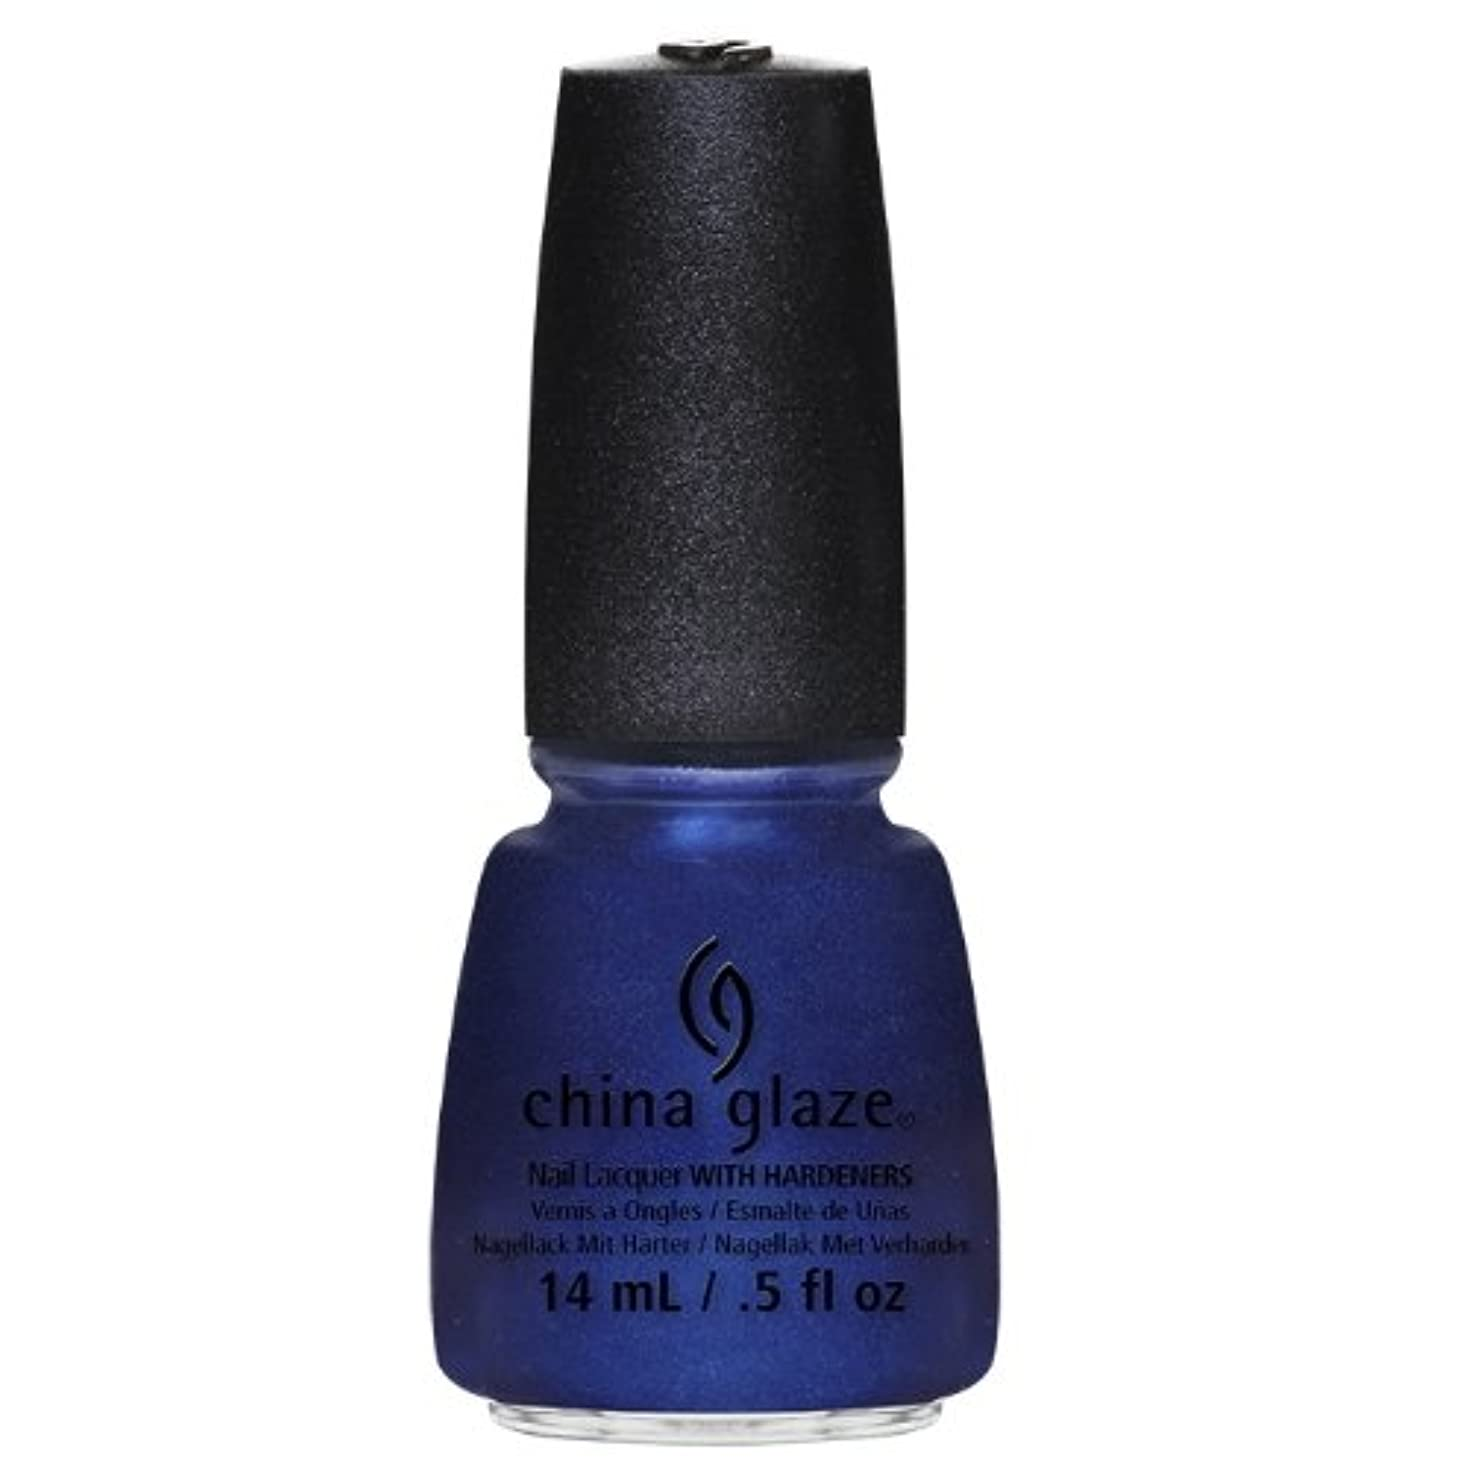 CHINA GLAZE Nail Lacquer - Autumn Nights - Scandalous Shenanigans (並行輸入品)